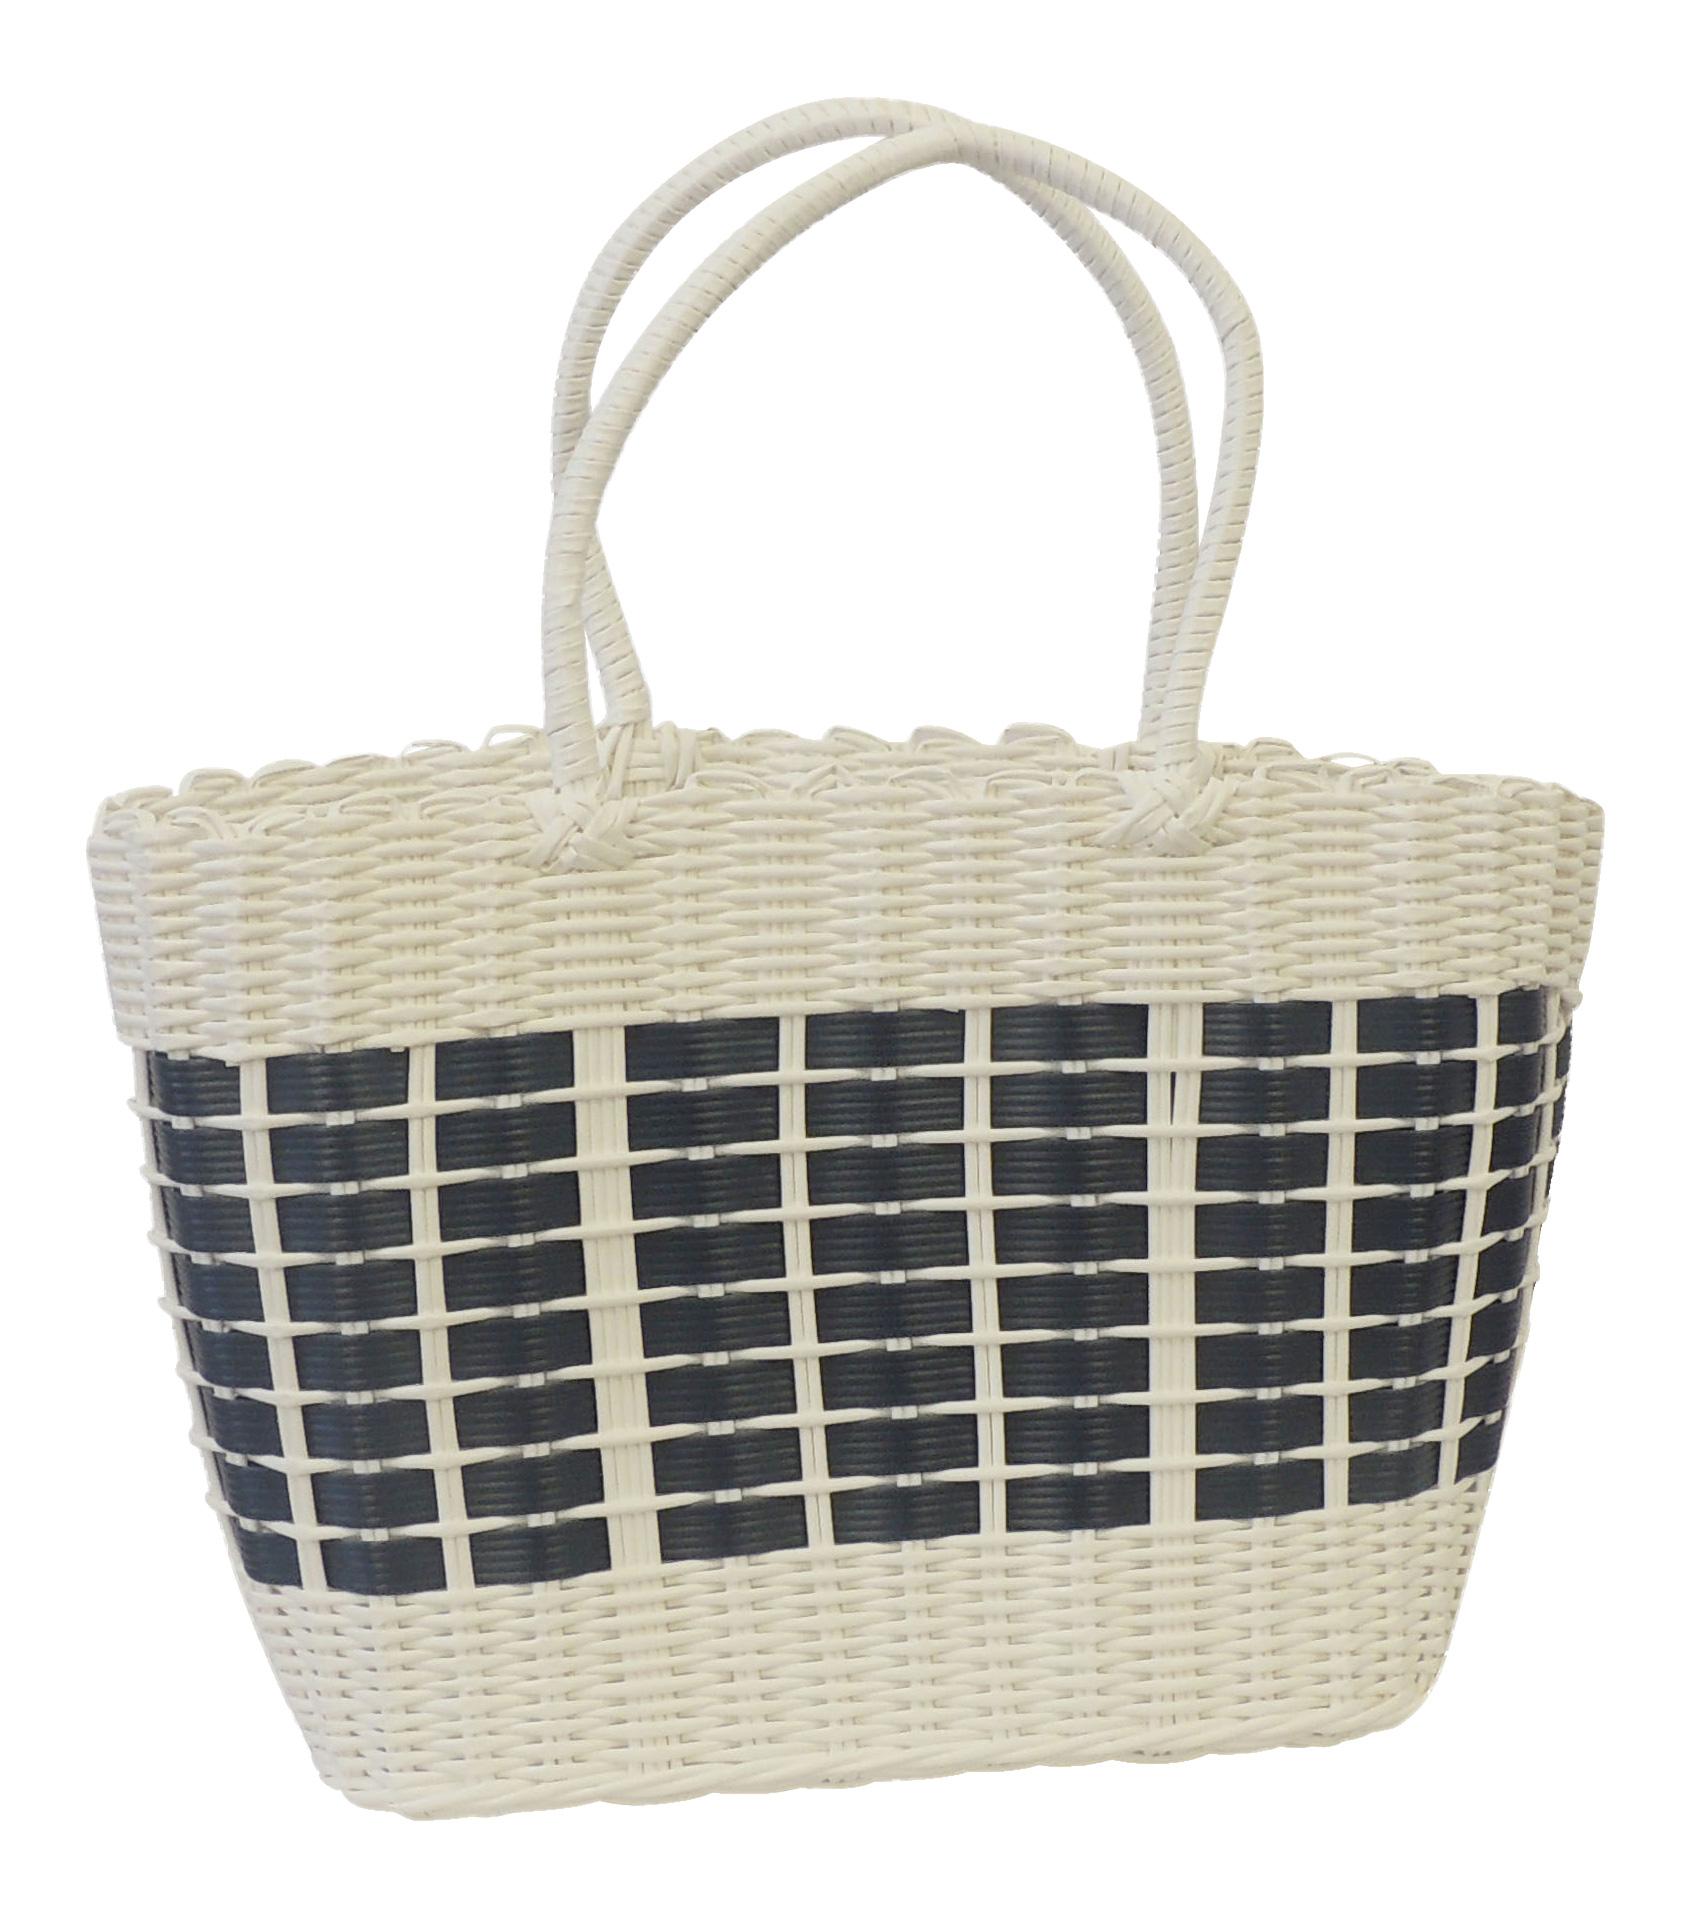 Vintage Retro Style Shopping Basket Beach Grocery Plastic Woven Storage Bag New